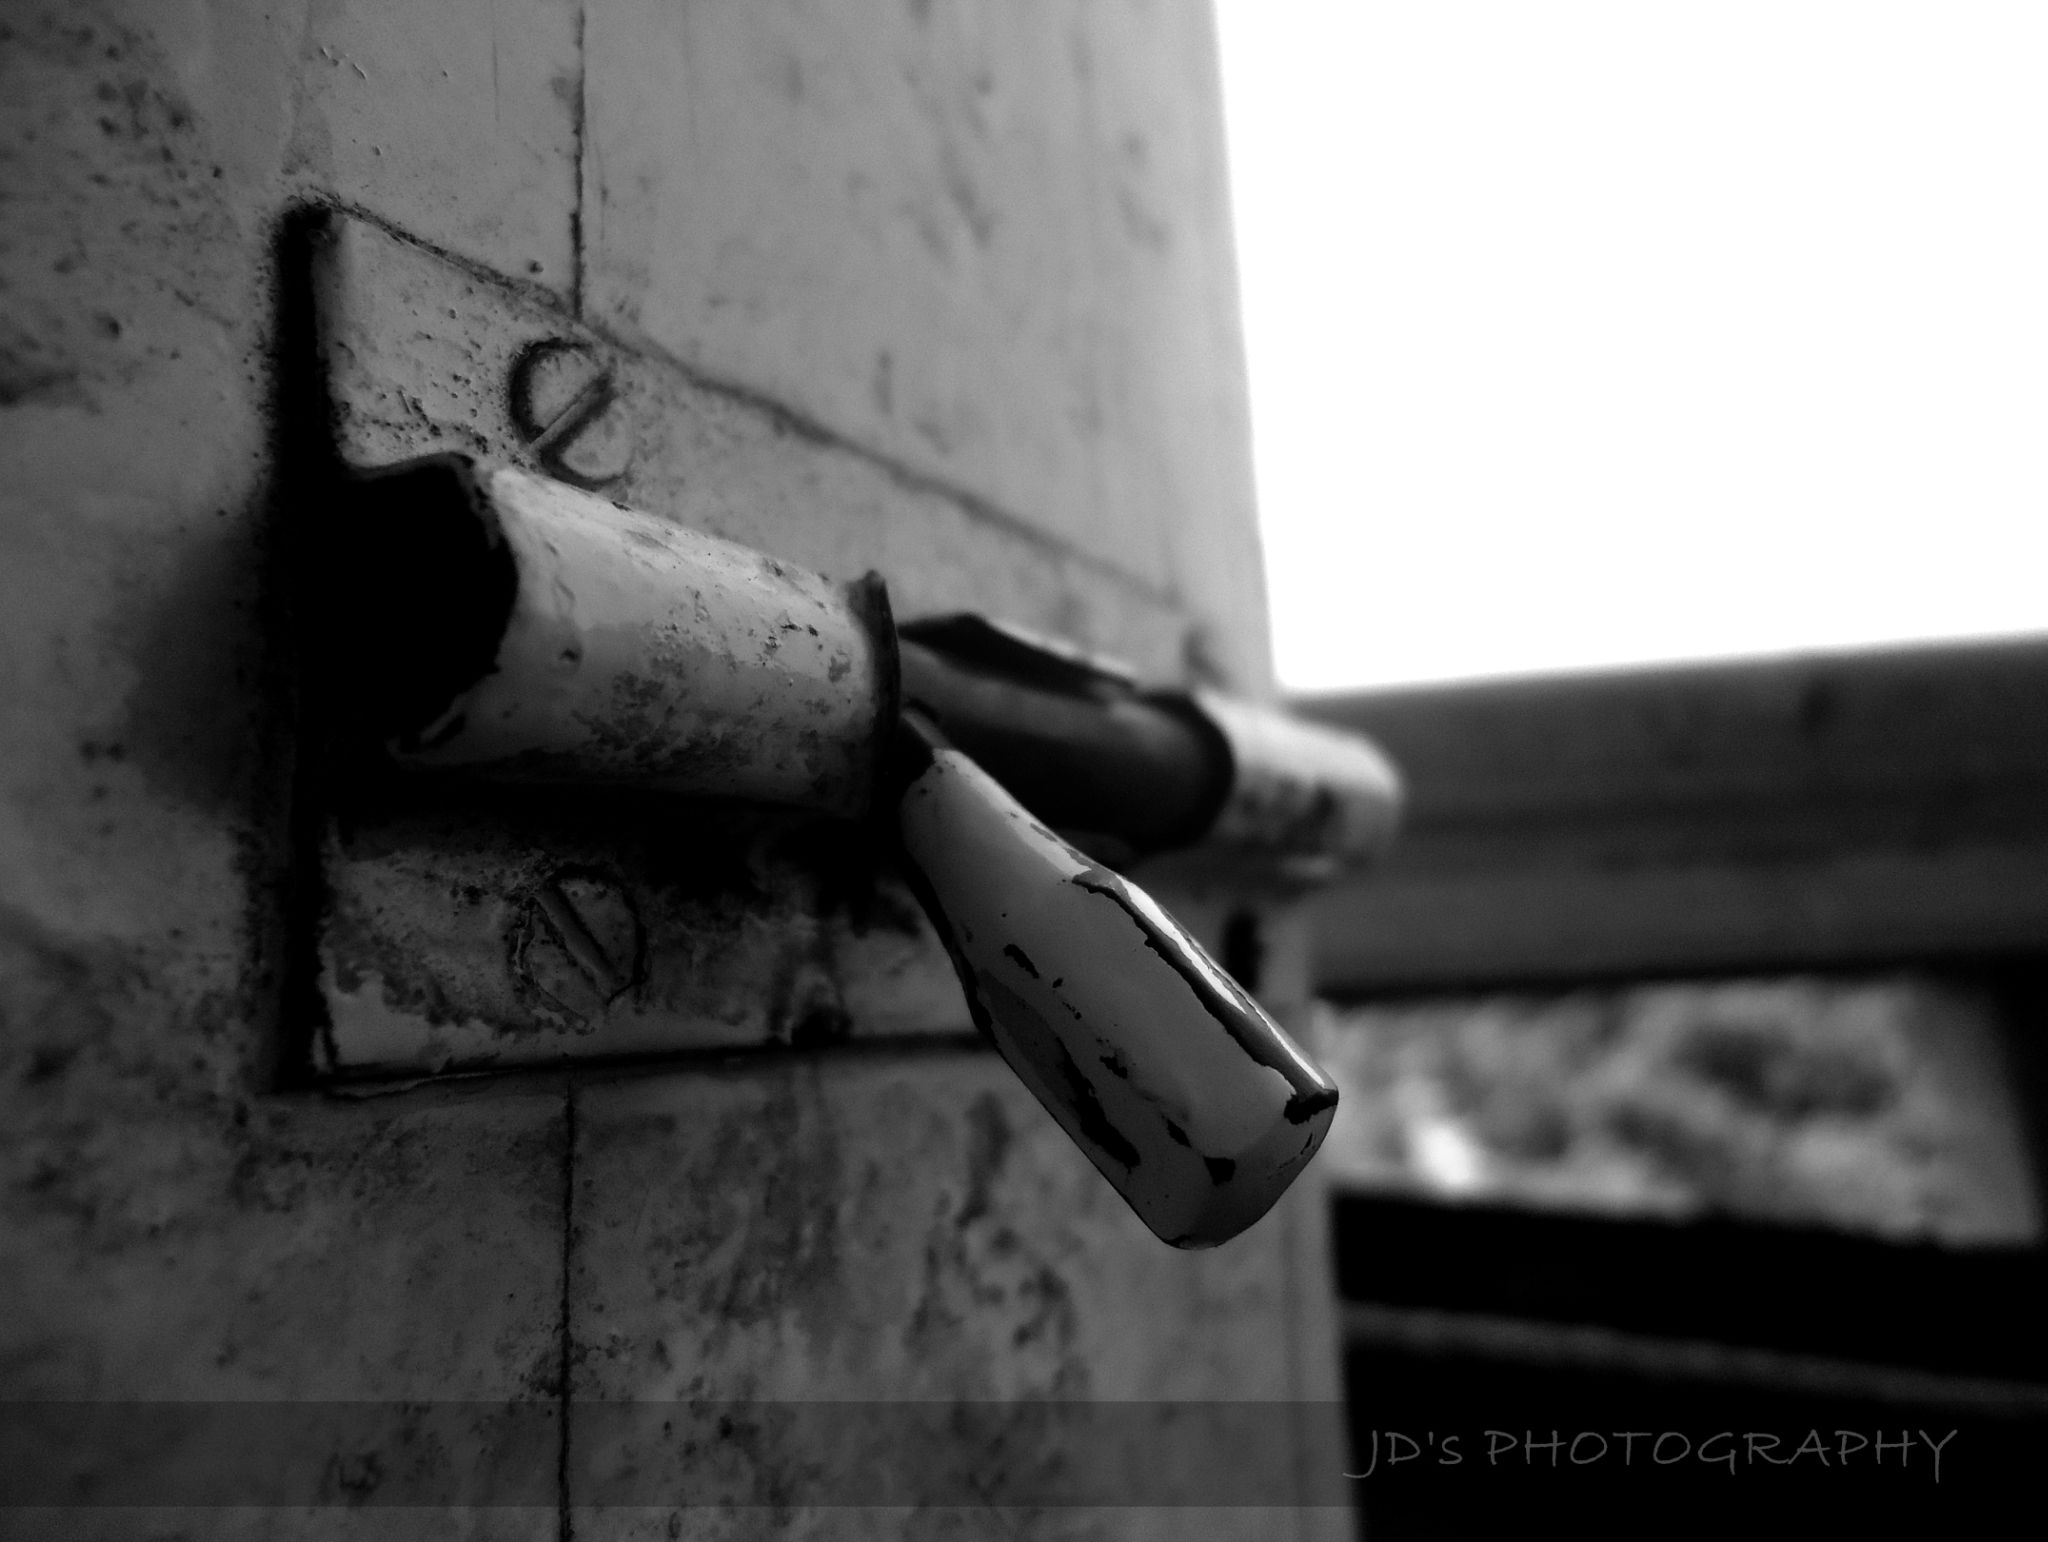 Black (JD's Photography) by jawwad.khalil.16